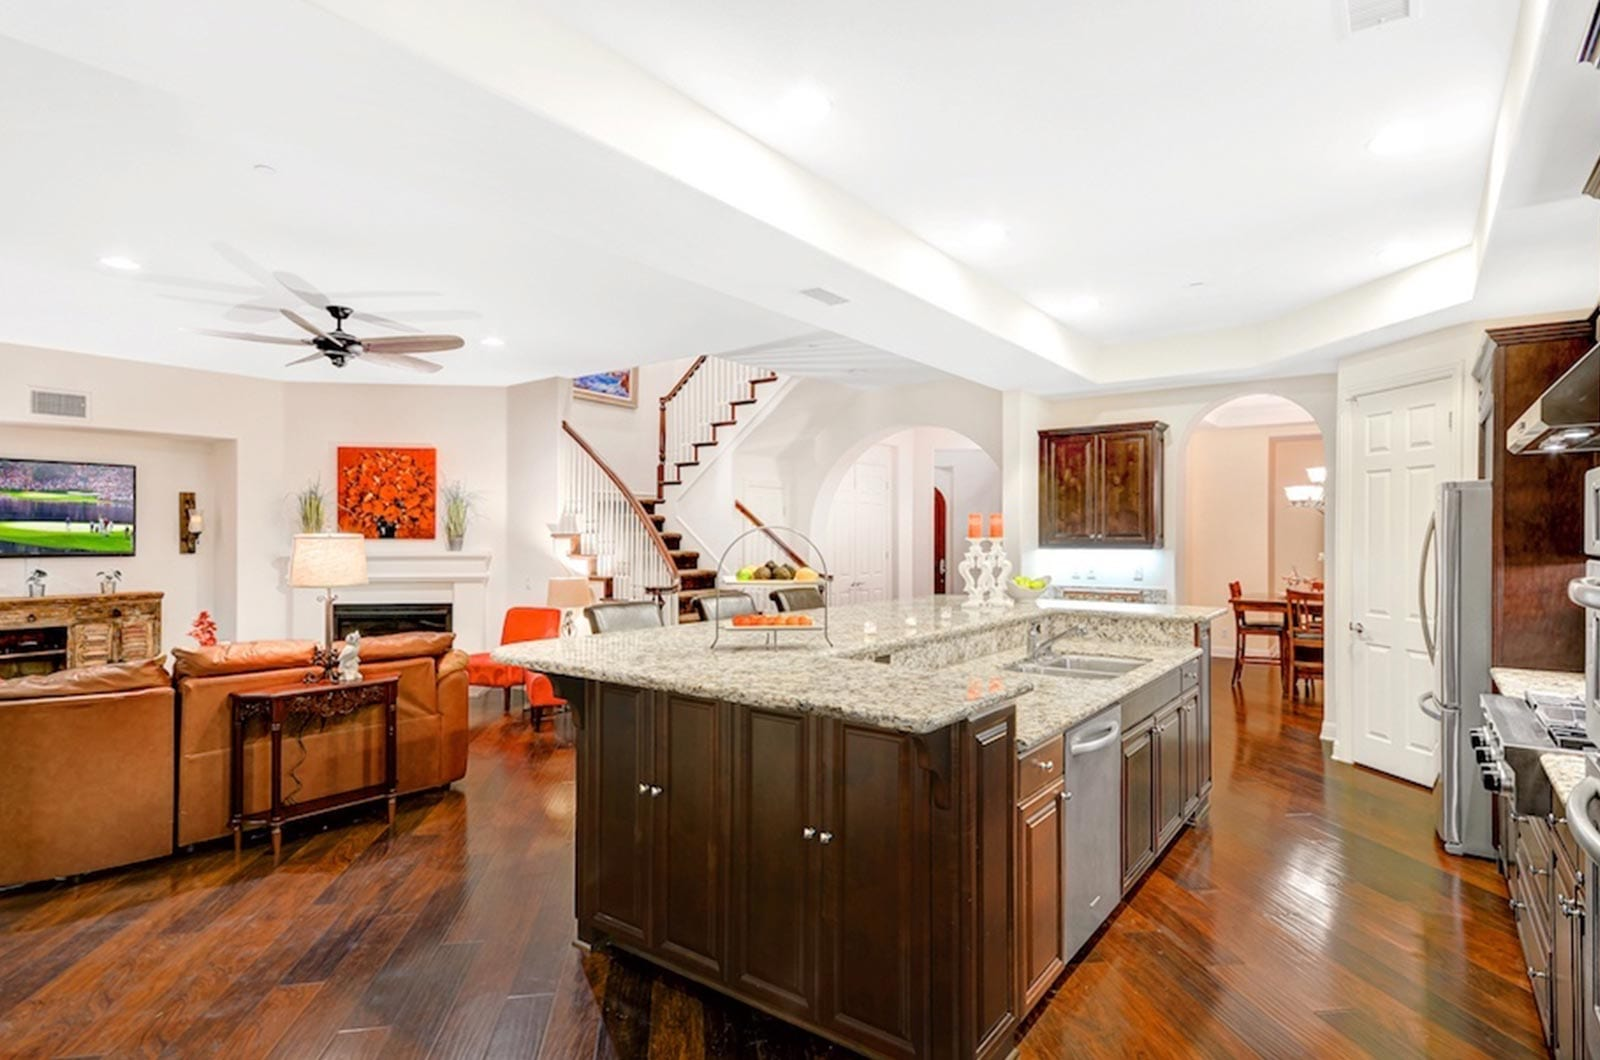 luxury-real-estate-photography-hero-image